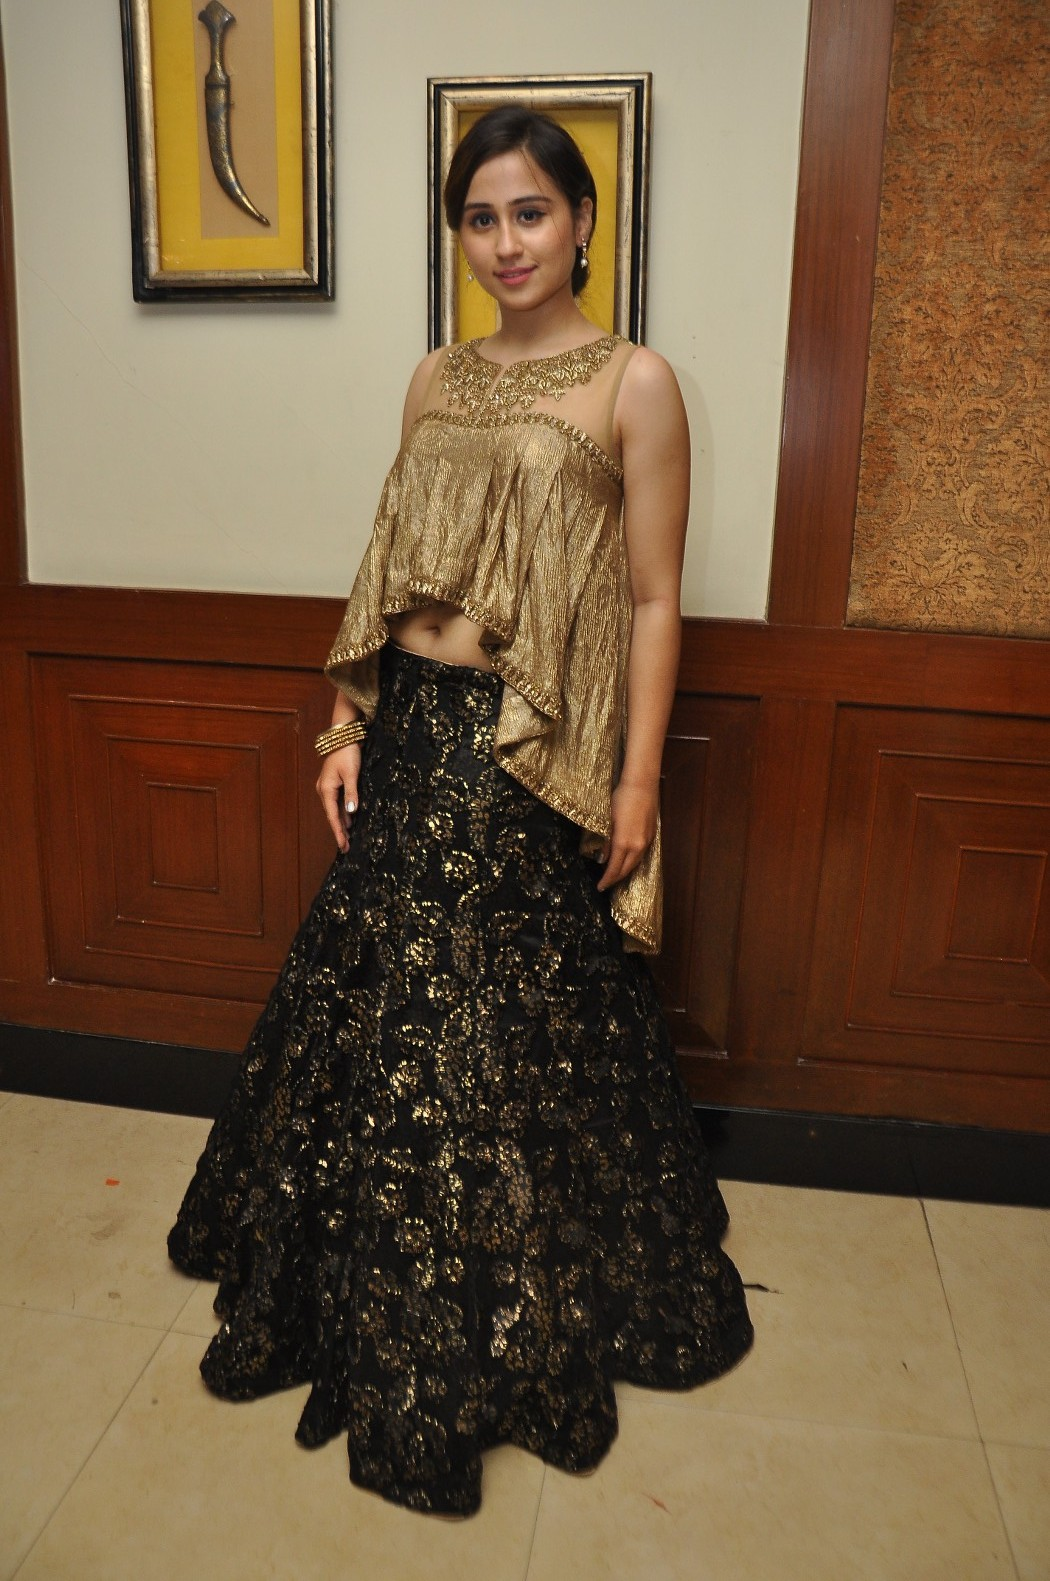 Love For Handloom Celebs and Models Dazzle In Elegant Outfit   Love For Handloom Praneetha Love For Handloom 490